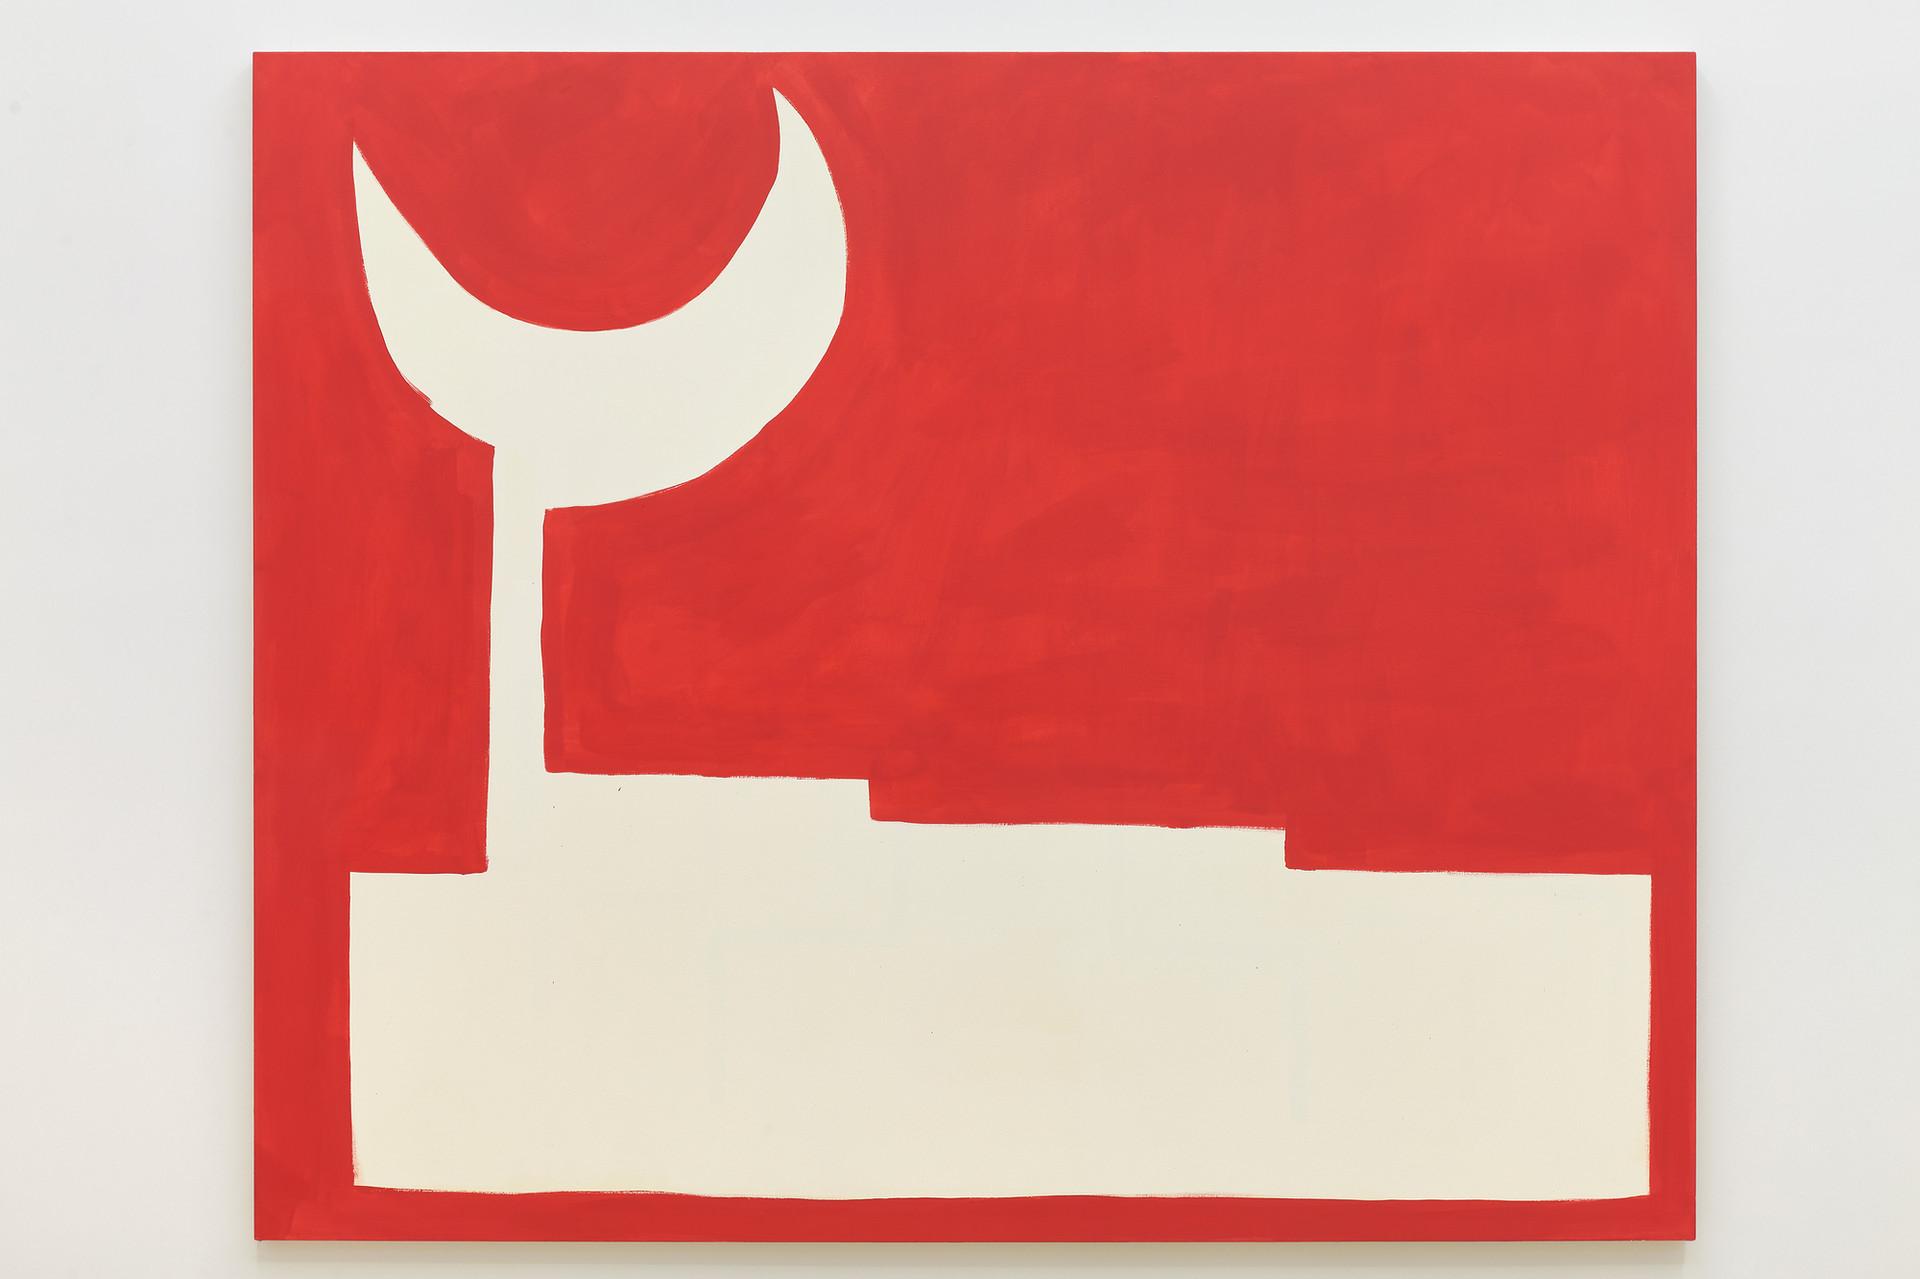 Stephen Felton Scorpio, 2020 Acrylic on canvas 66 x 80 inches